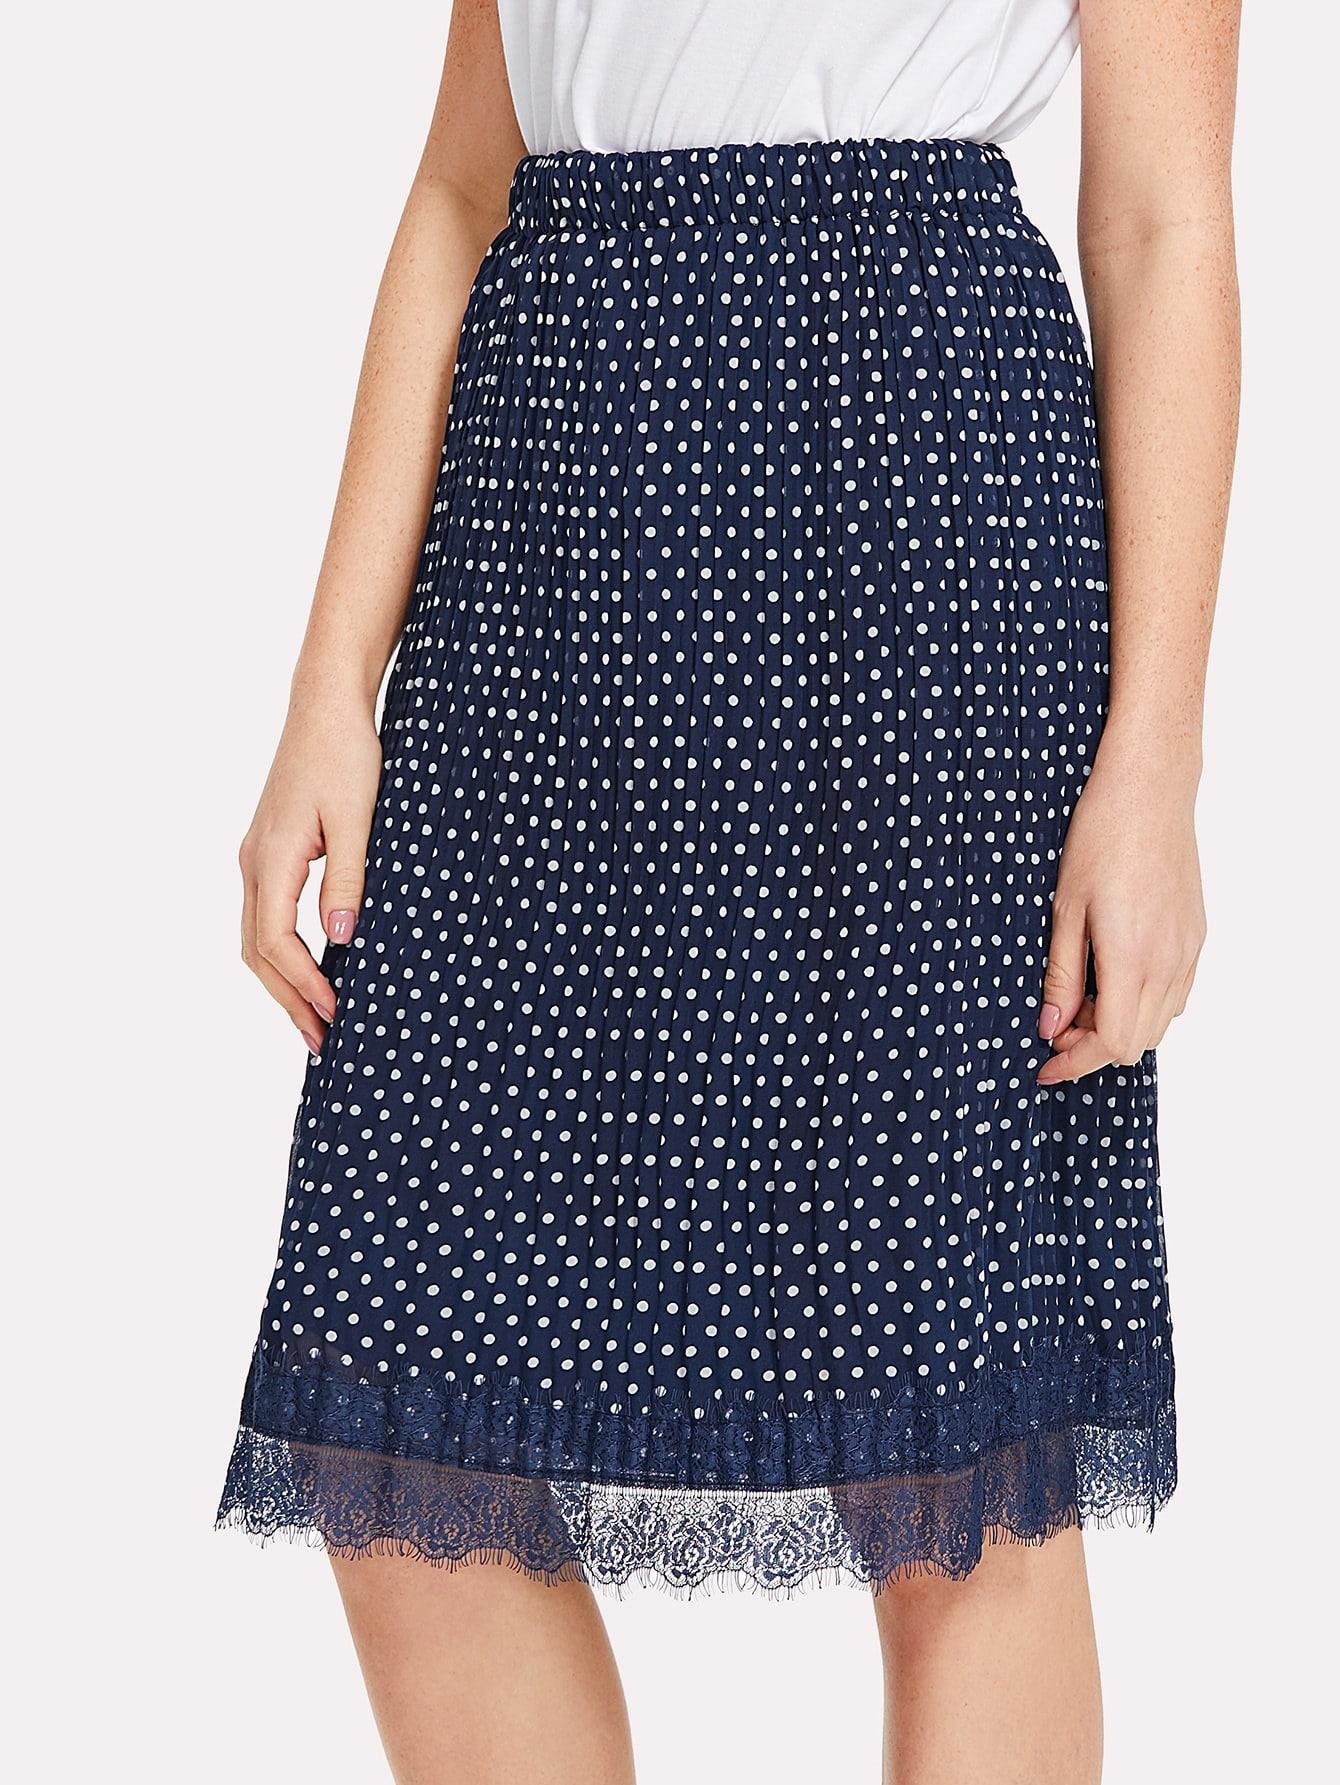 Lace Hem Polka Dot Pleated Skirt single breasted polka dot pleated skirt